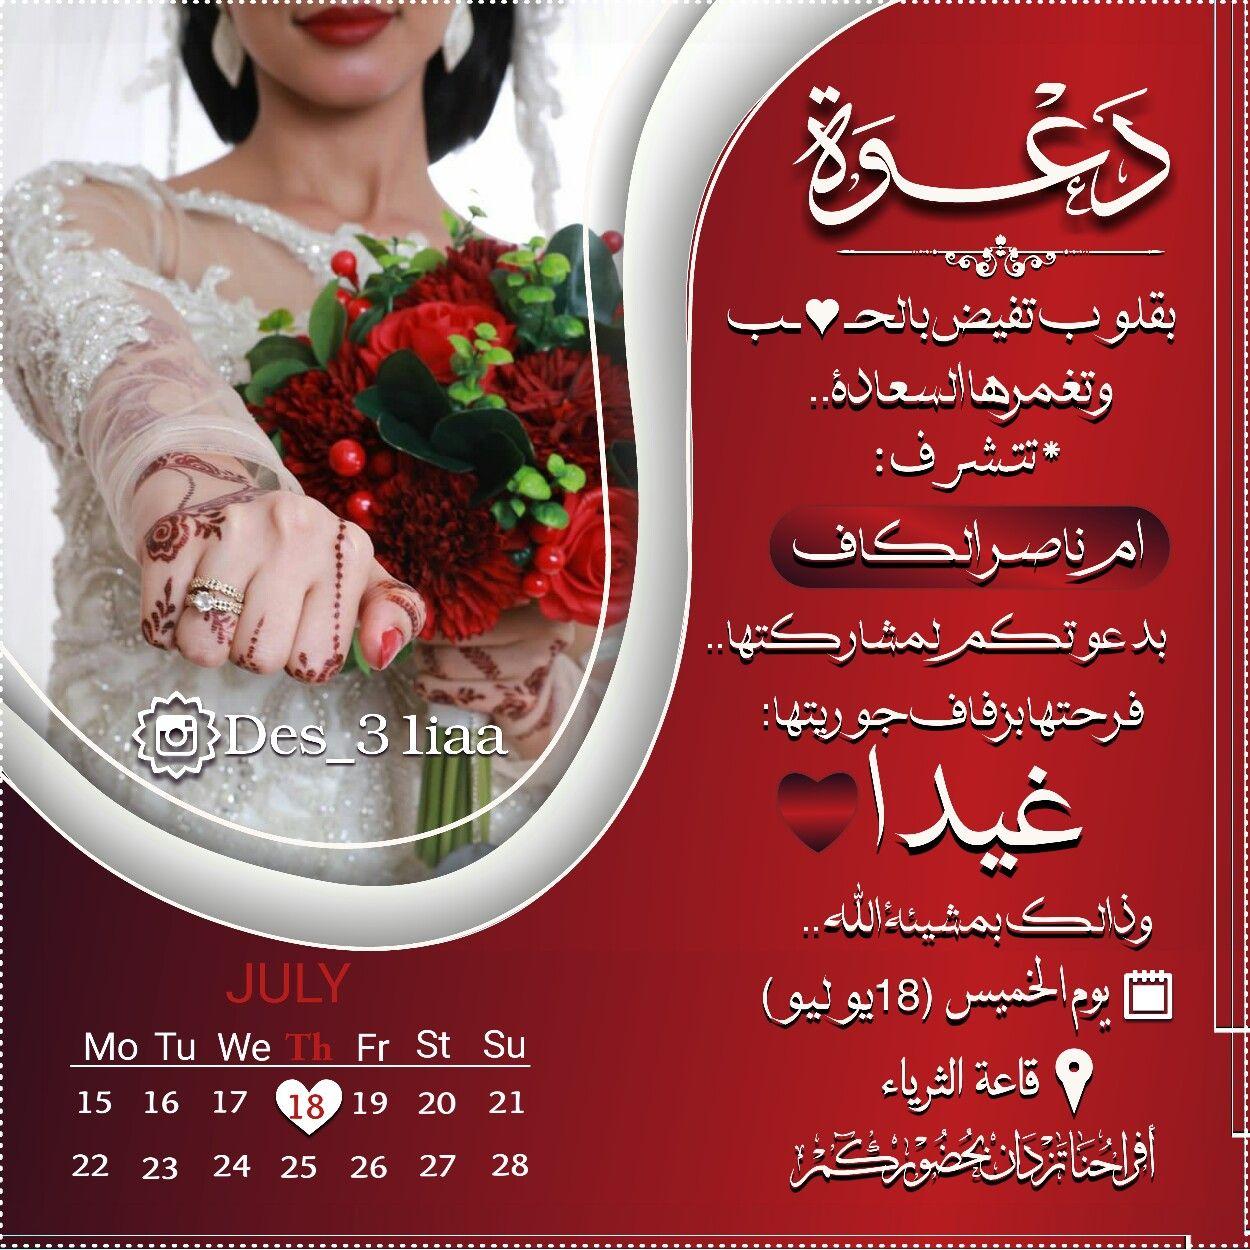 دعوة زفاف Wedding Invitation Posters Arab Wedding Engagement Photos